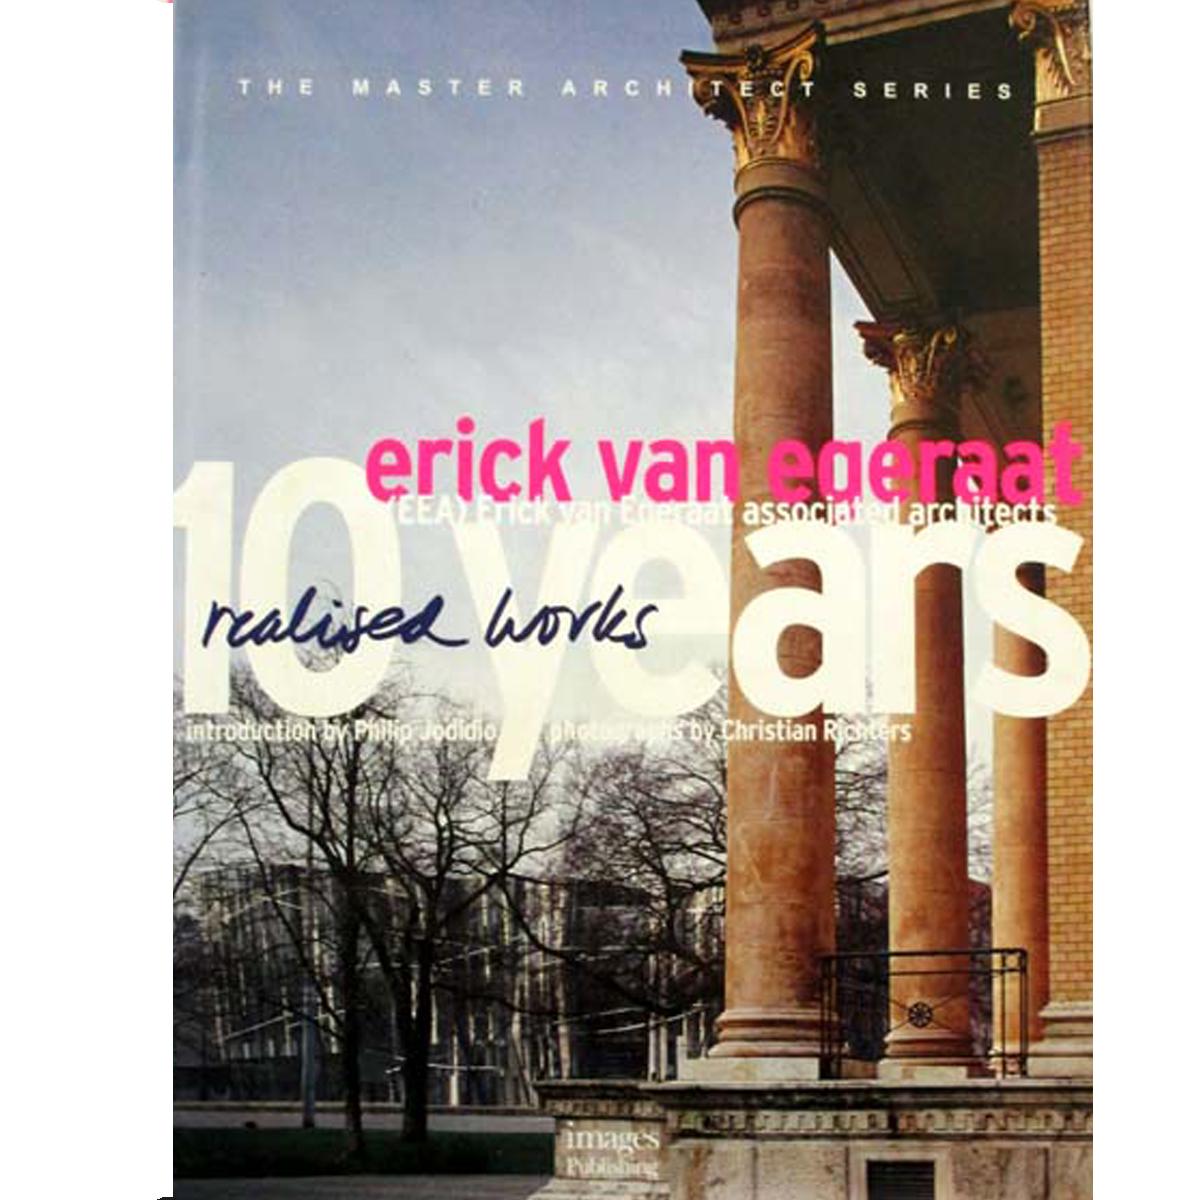 Erick van Egeraat: 10 Years